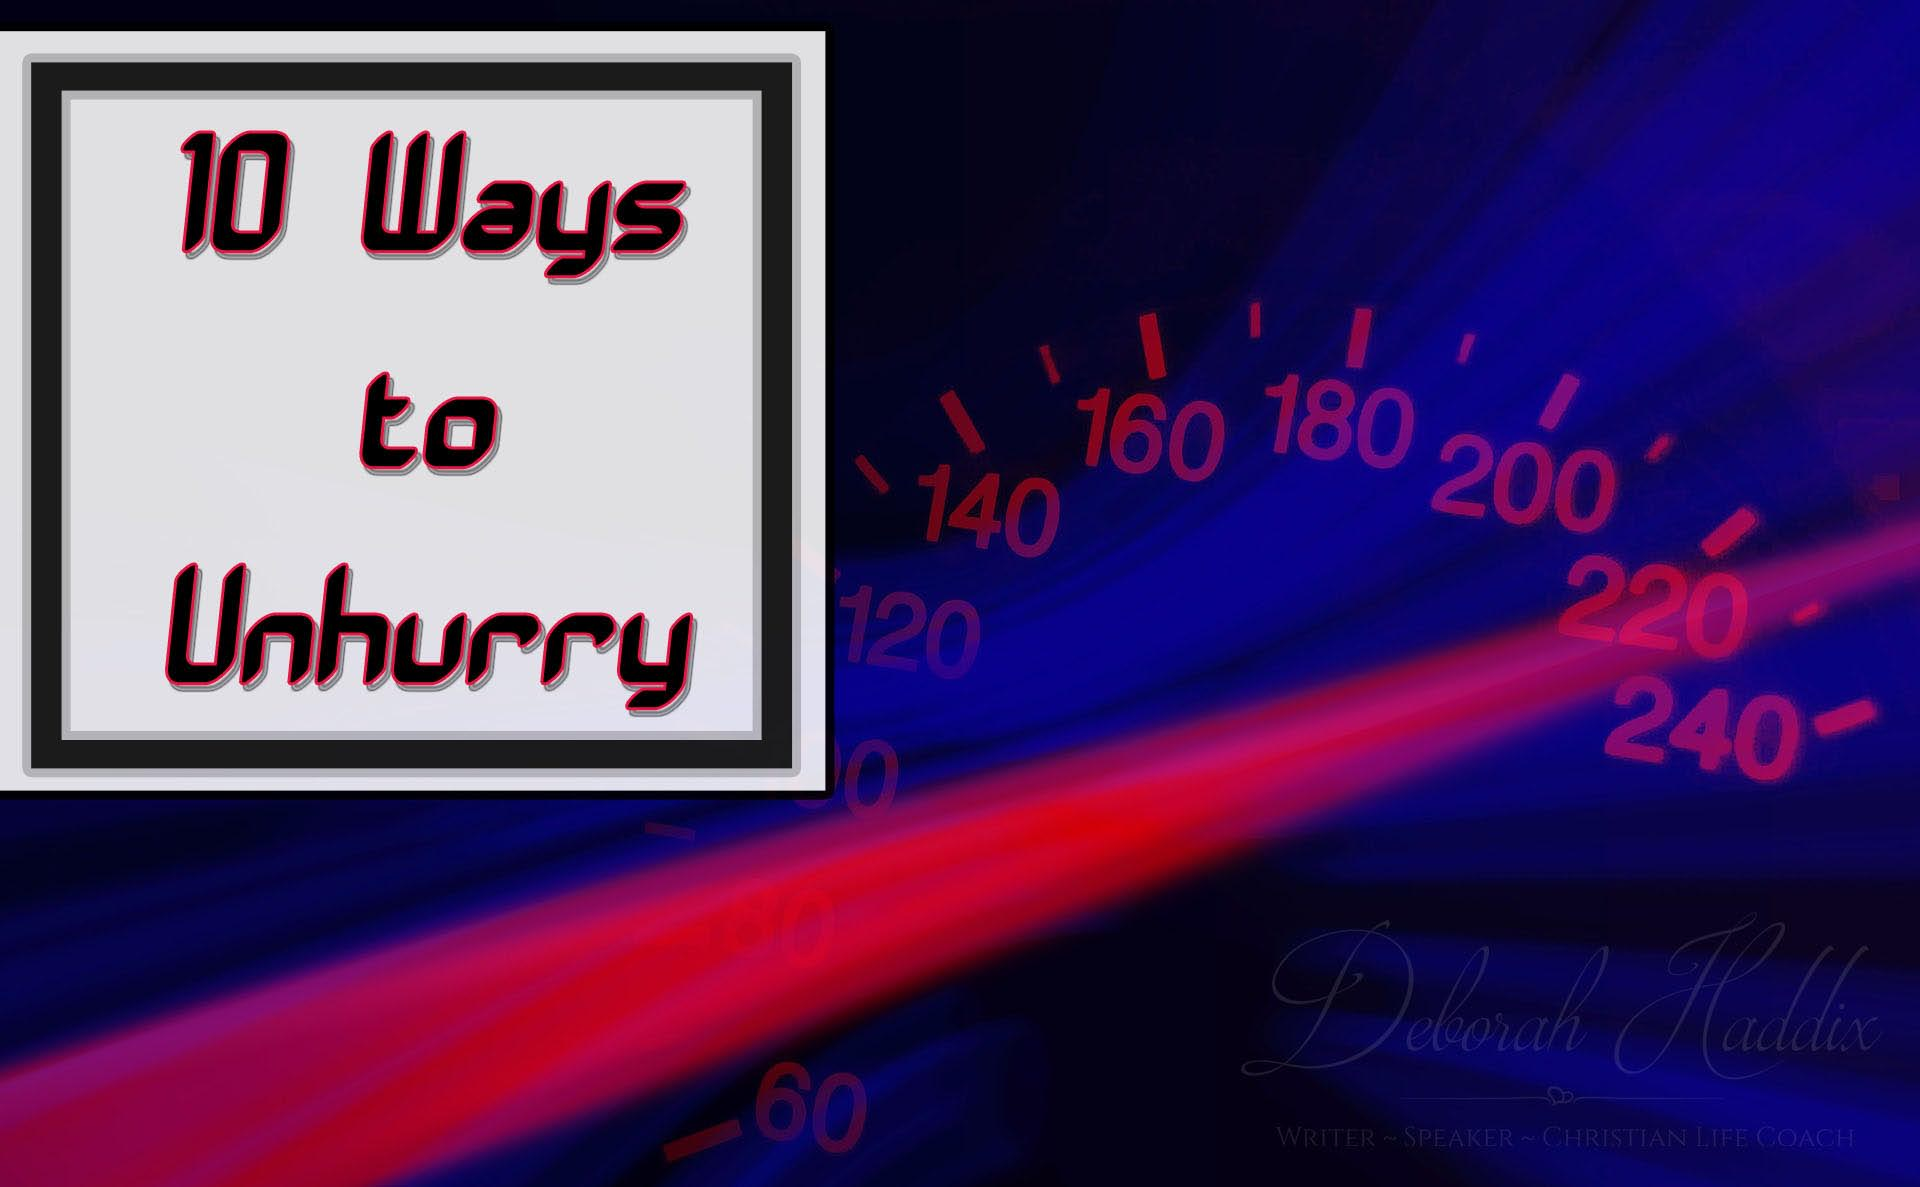 10 Ways to Unhurry